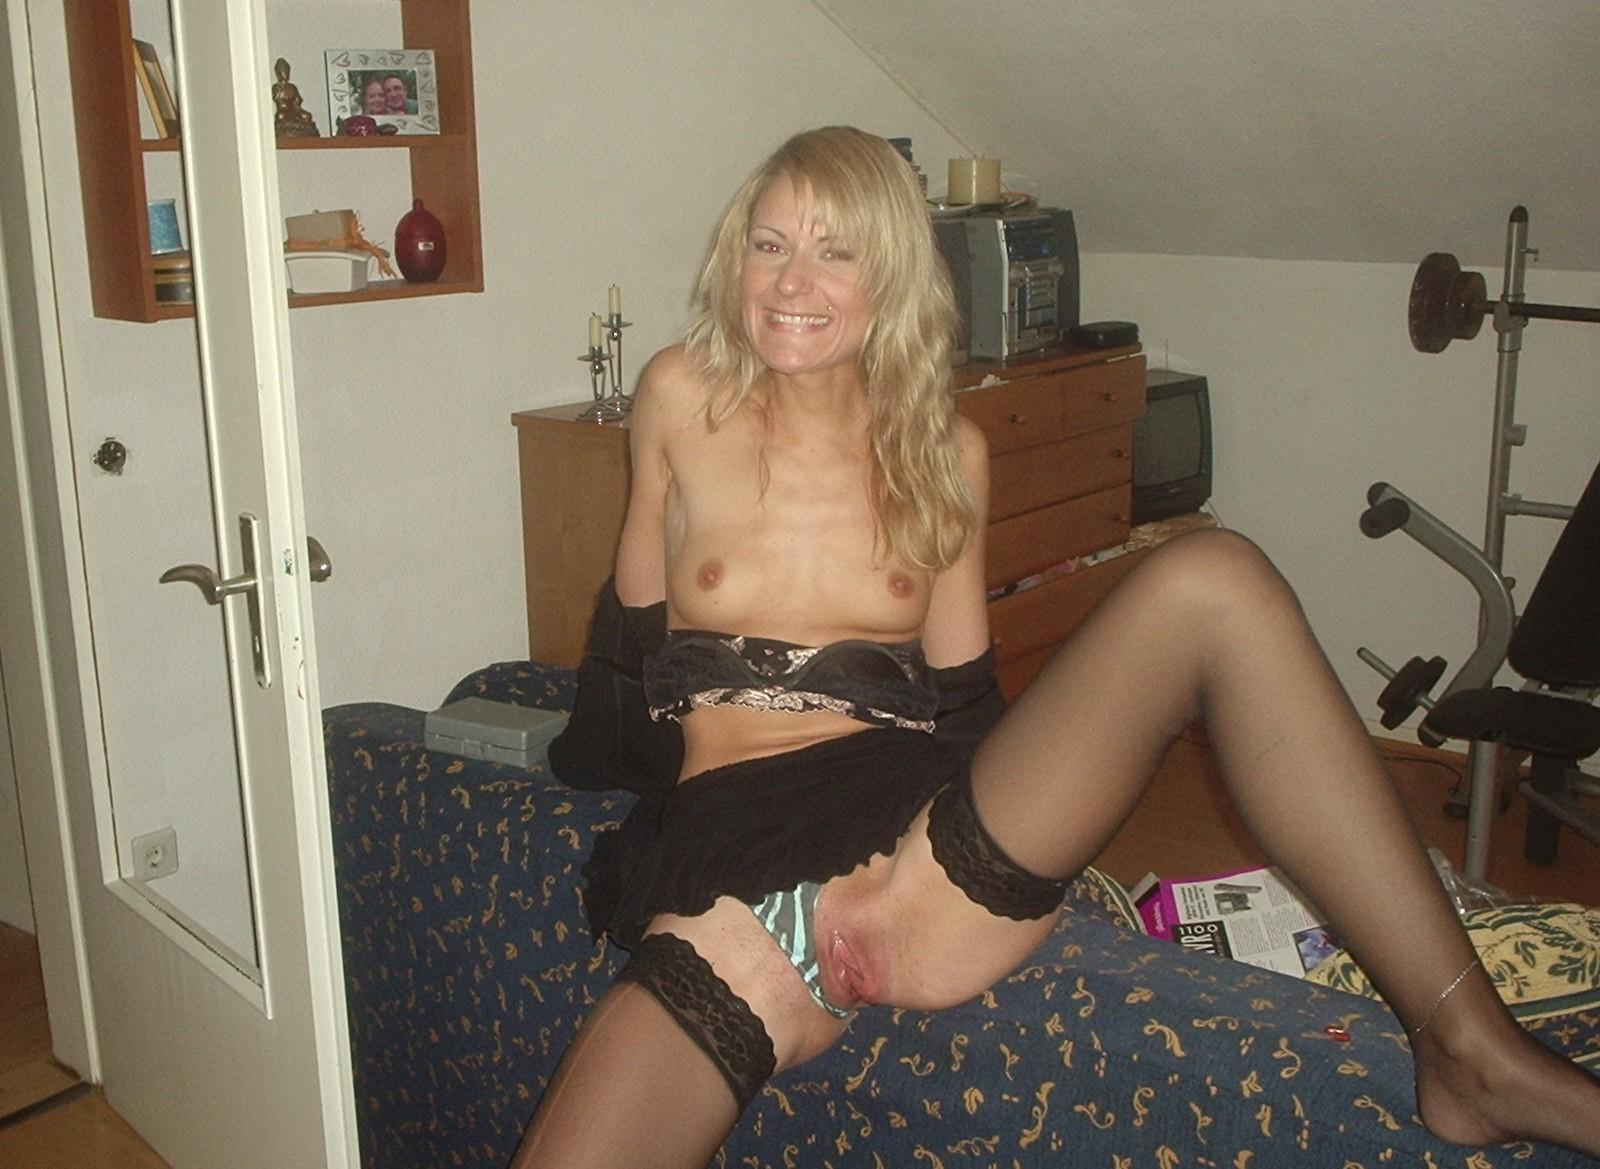 http://pbs-2.adult-empire.com/85/8570/003/pic/8.jpg